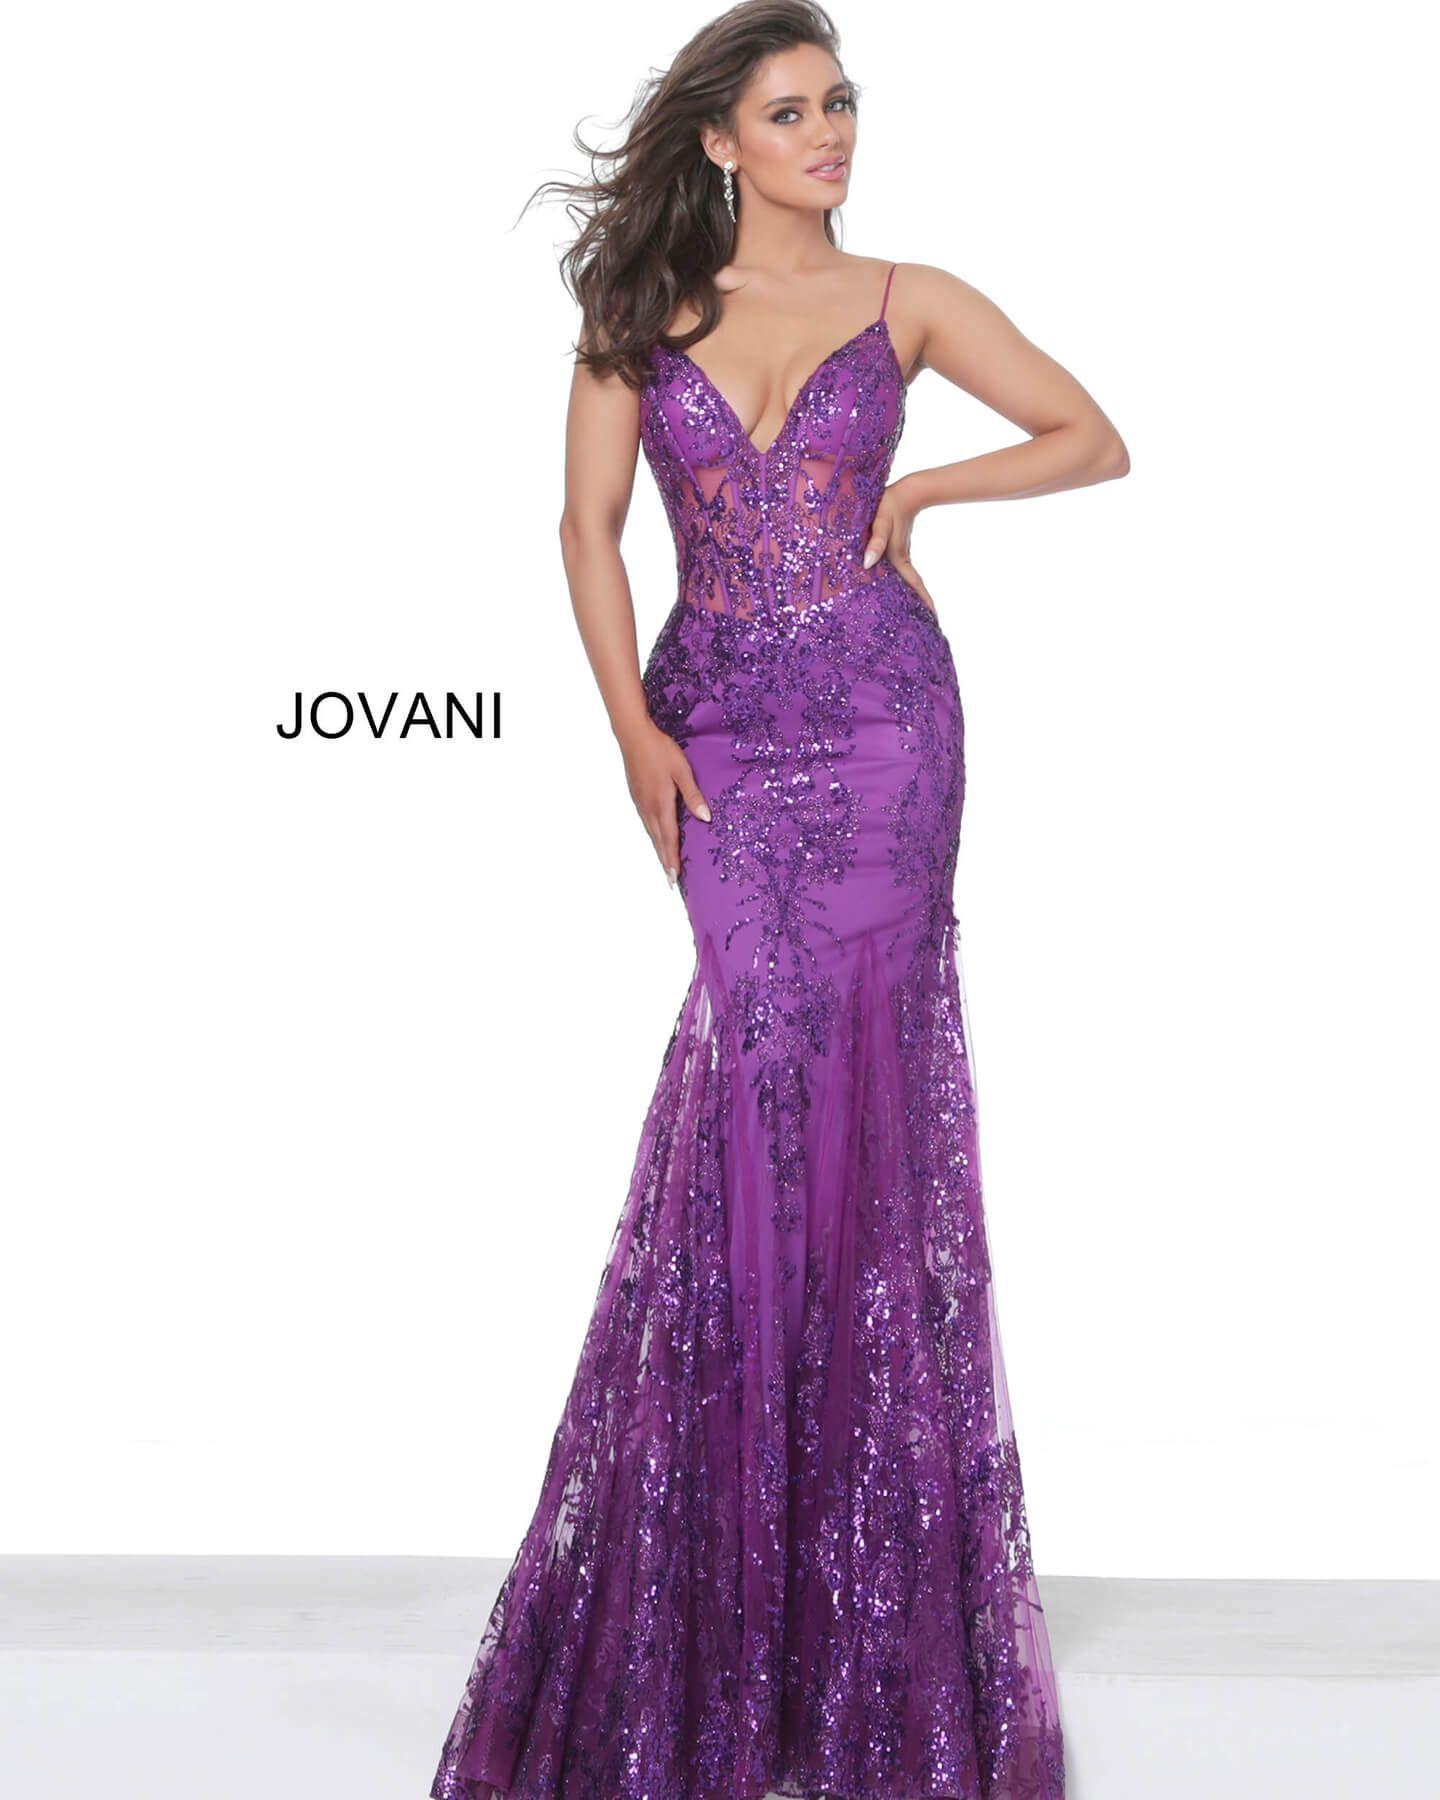 Pin By Manyinchals On Corset Lavender Prom Dresses Purple Prom Dress Mermaid Violet Prom Dresses [ 1800 x 1440 Pixel ]